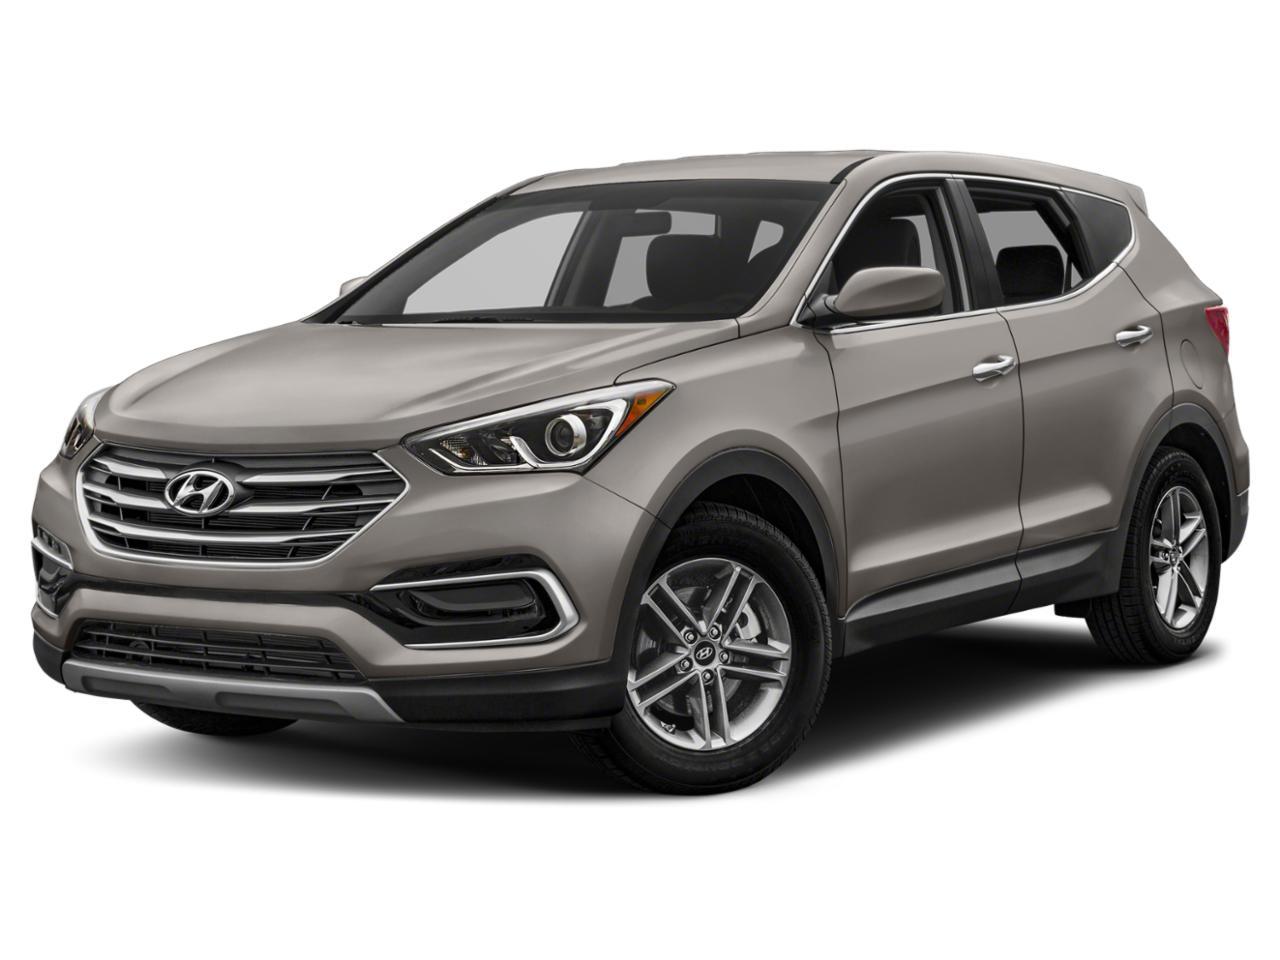 2018 Hyundai Santa Fe Sport Vehicle Photo in BEND, OR 97701-5133